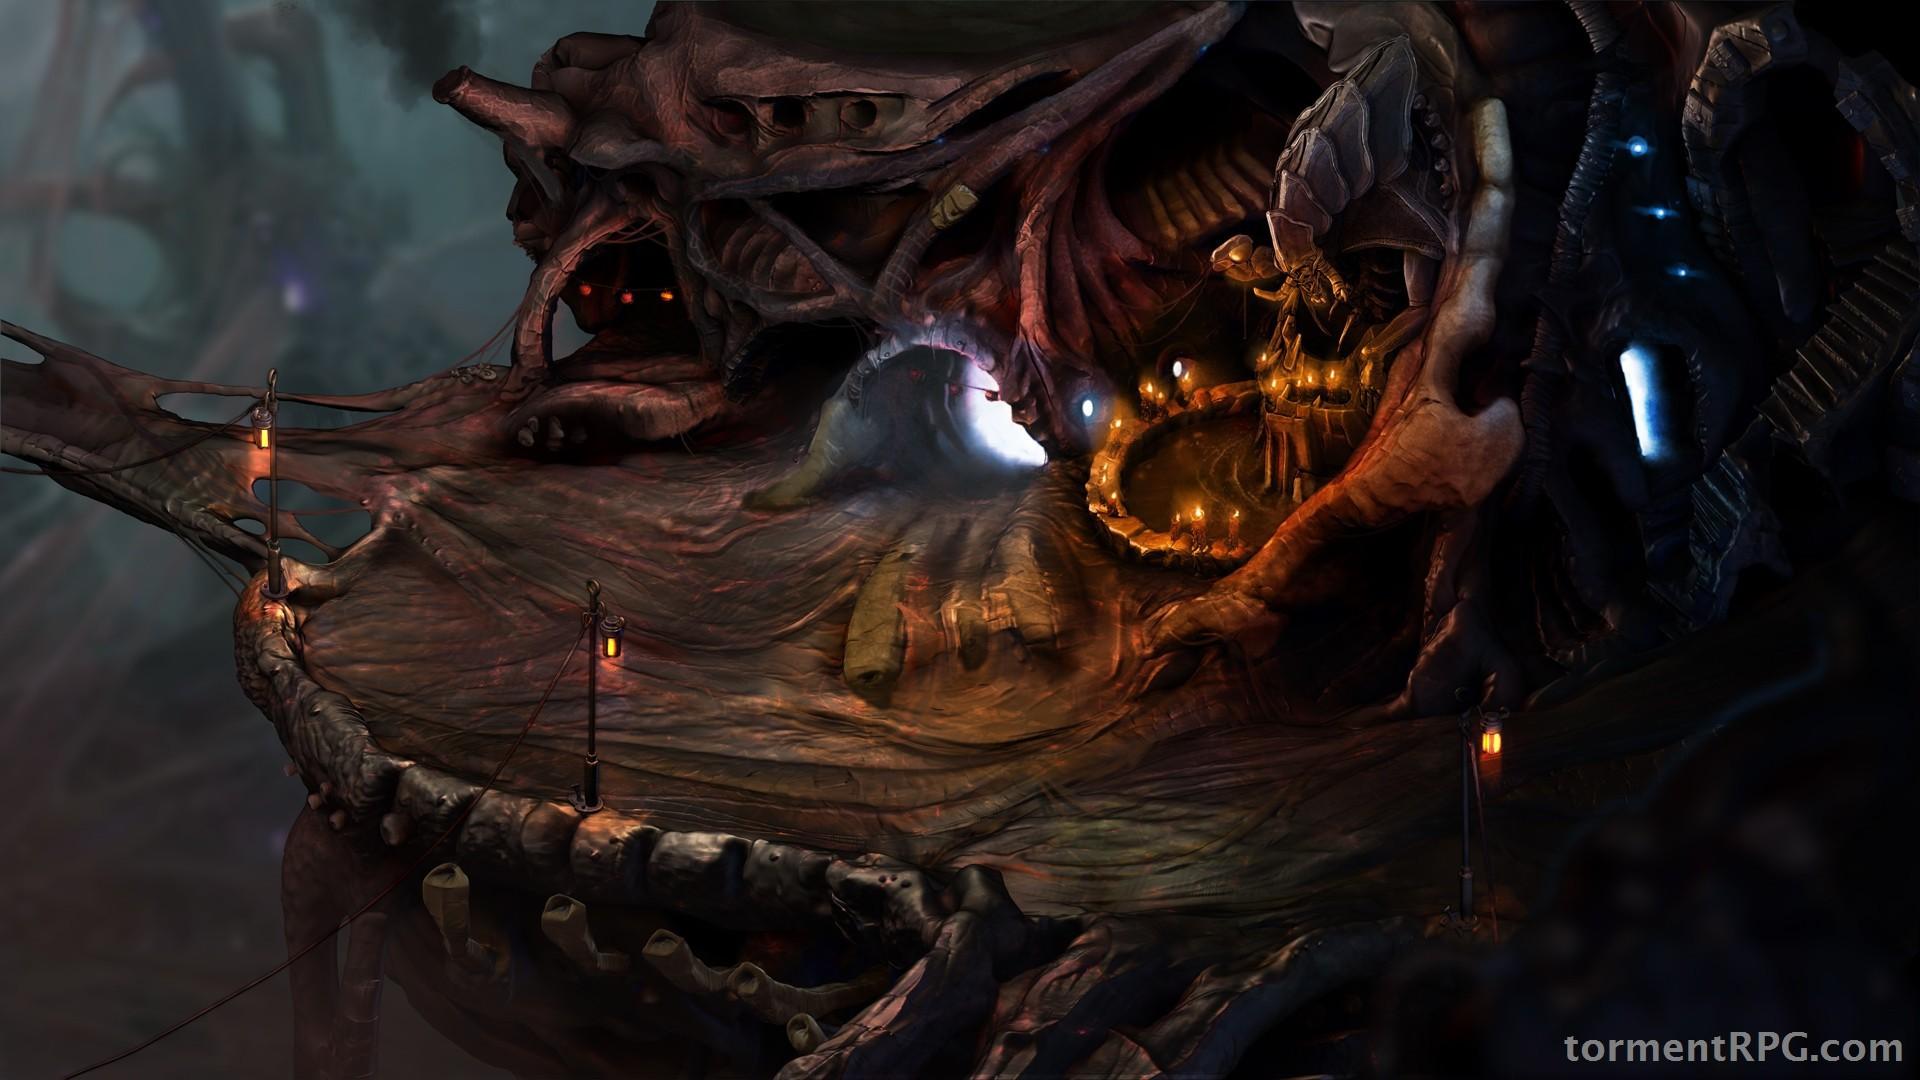 Torment : Tides of Numenéra